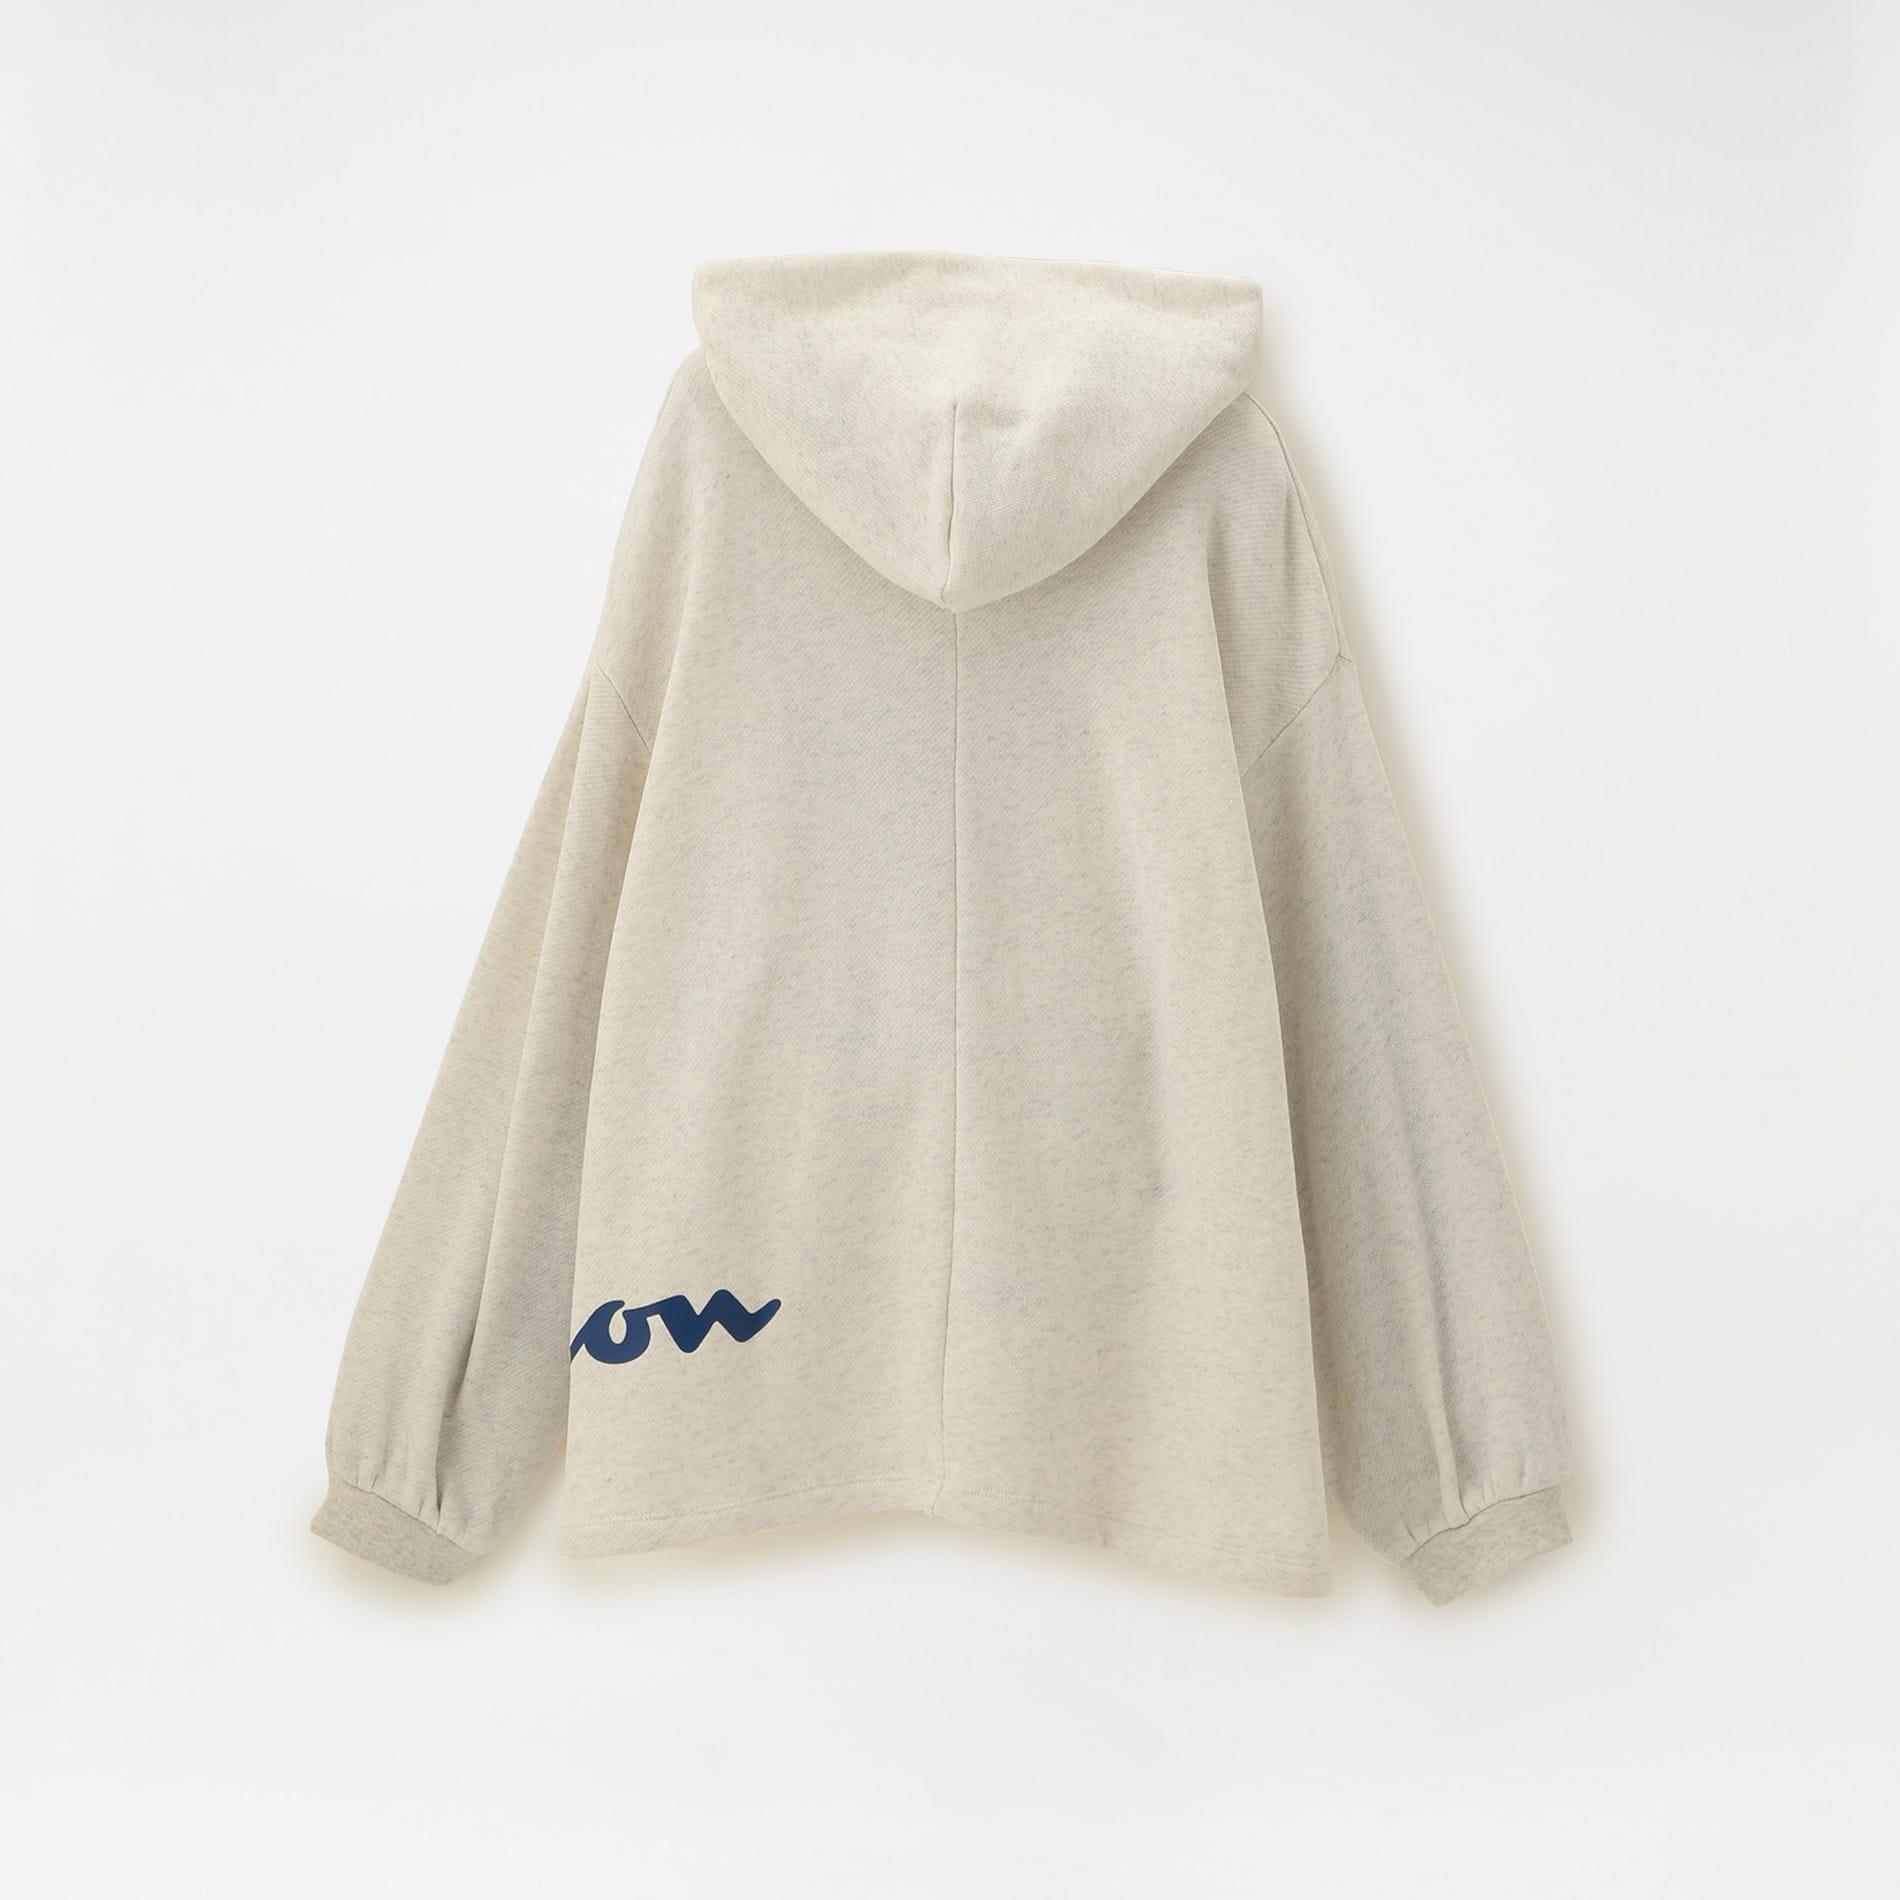 【Champion】WOMEN PULLOVER HOODED SWEATSHIRT CW-R103